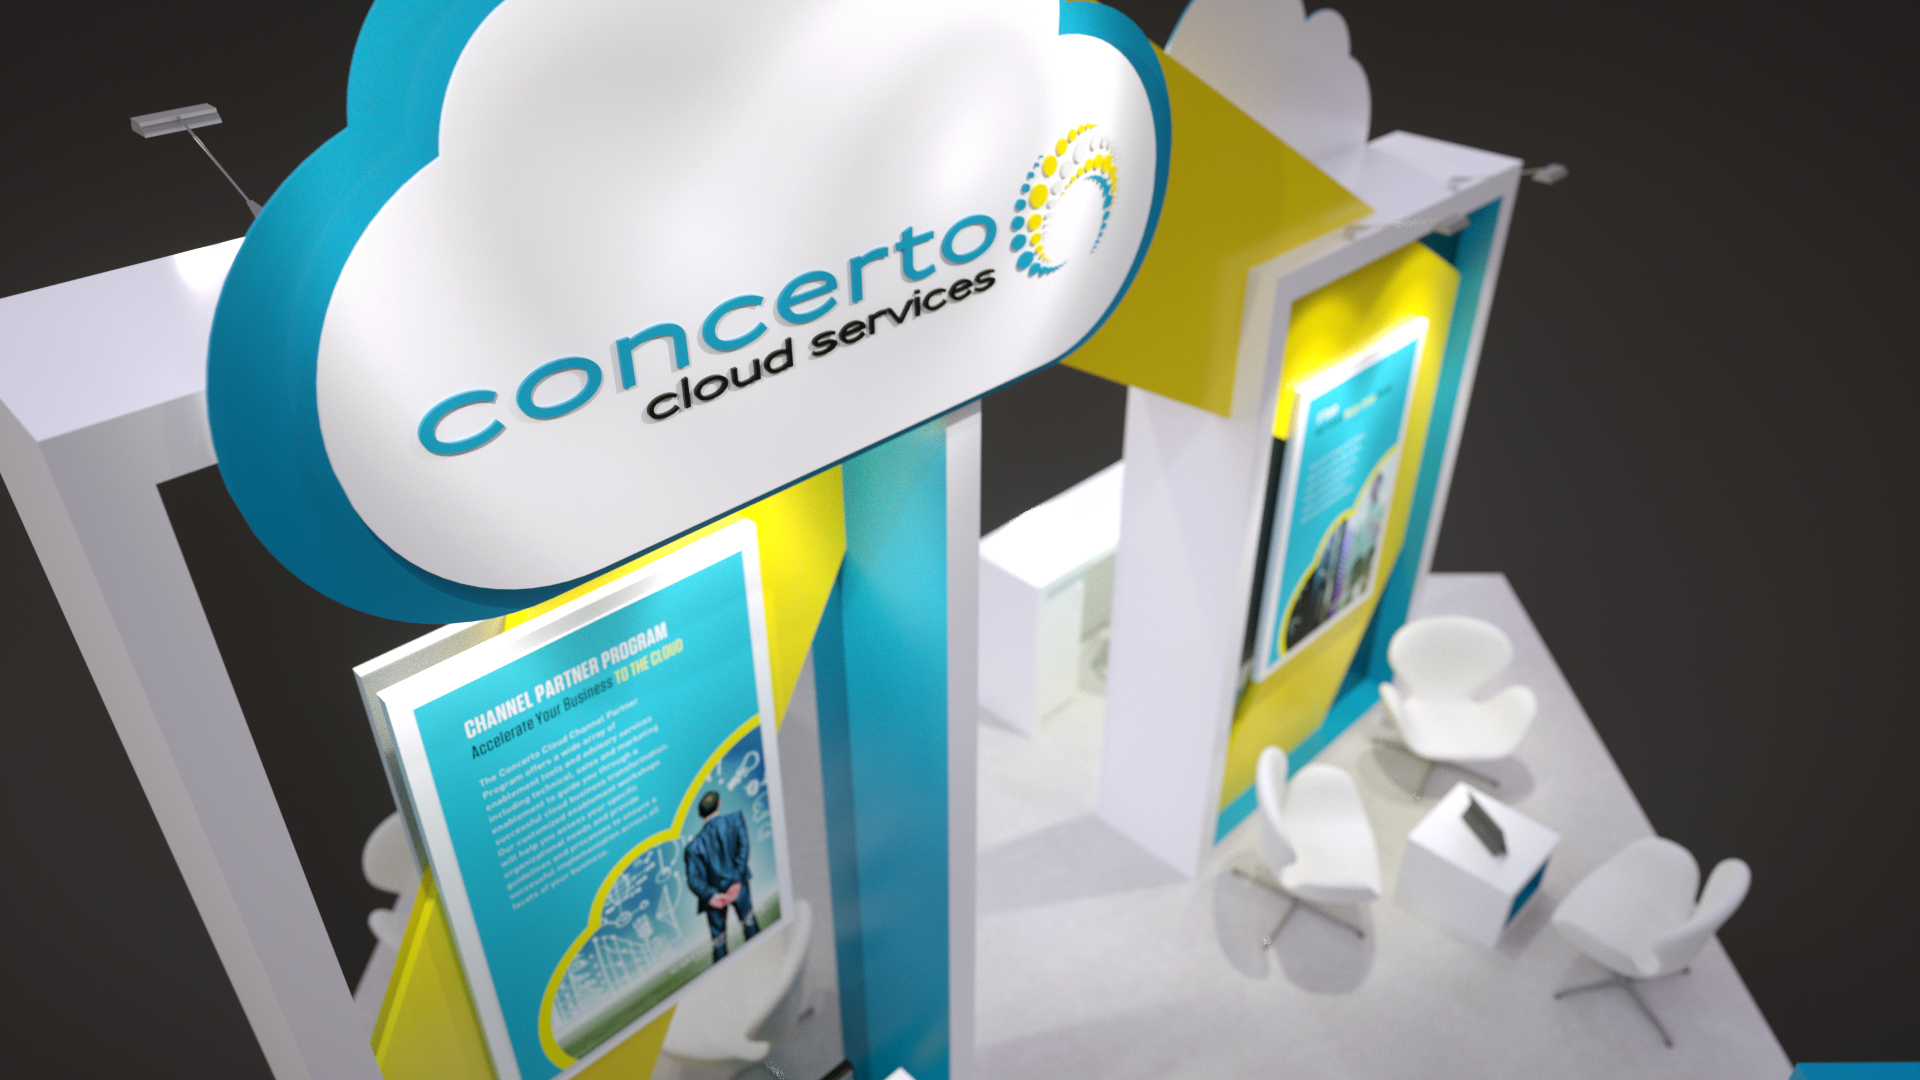 3053 - Concerto Cloud Services - Microsoft Envision 2016 - View 7.jpg